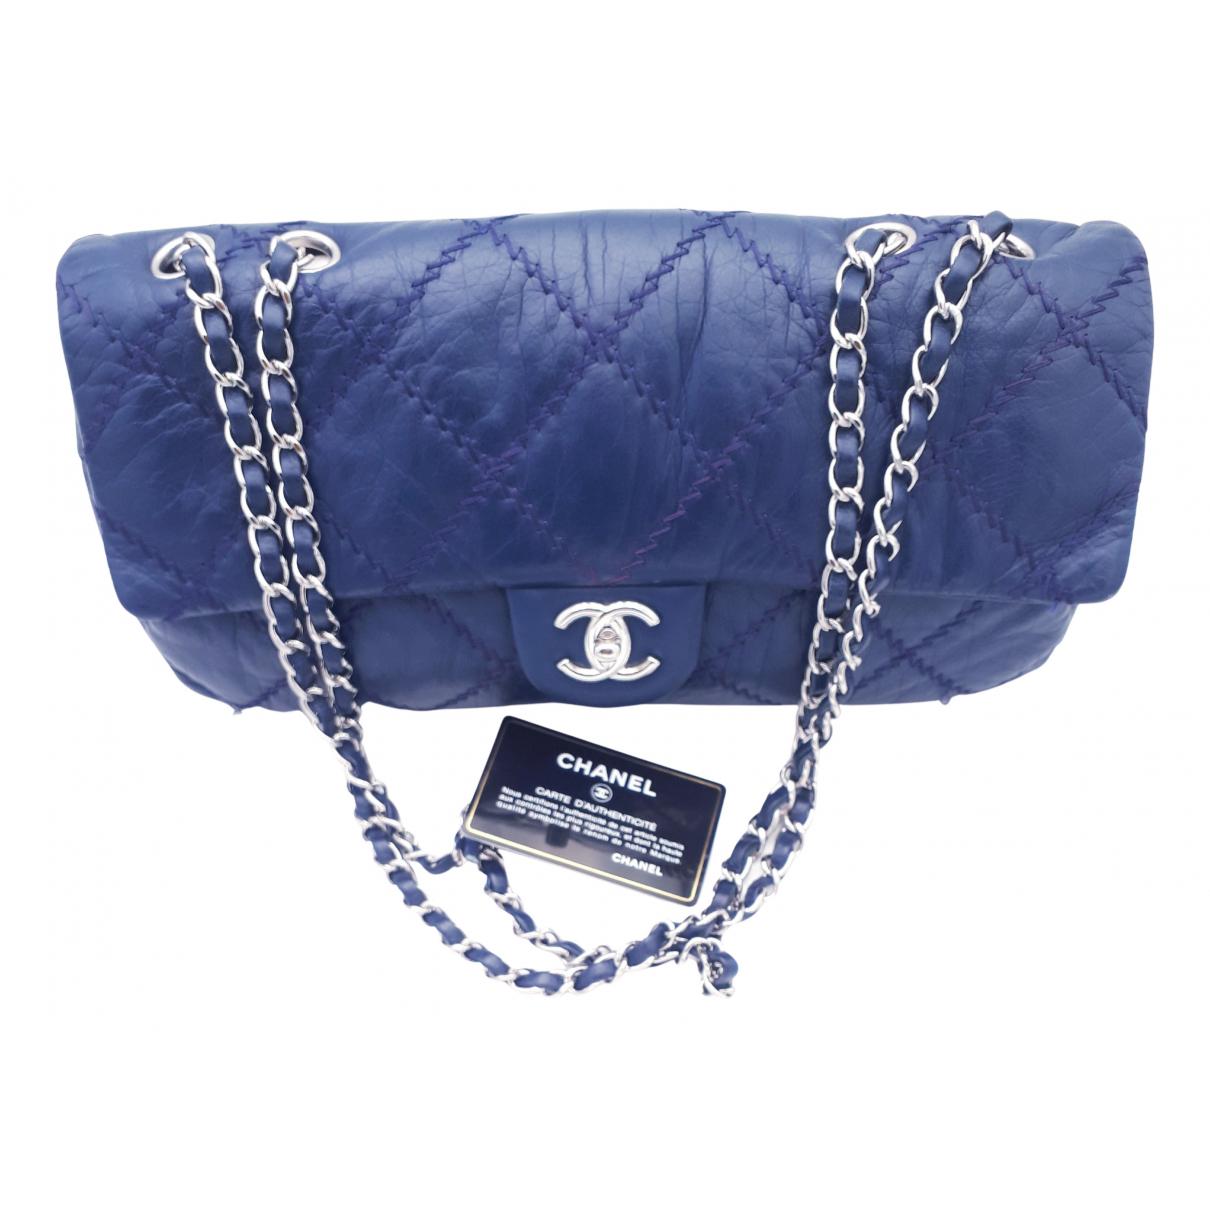 Chanel Timeless/Classique Blue Leather handbag for Women N